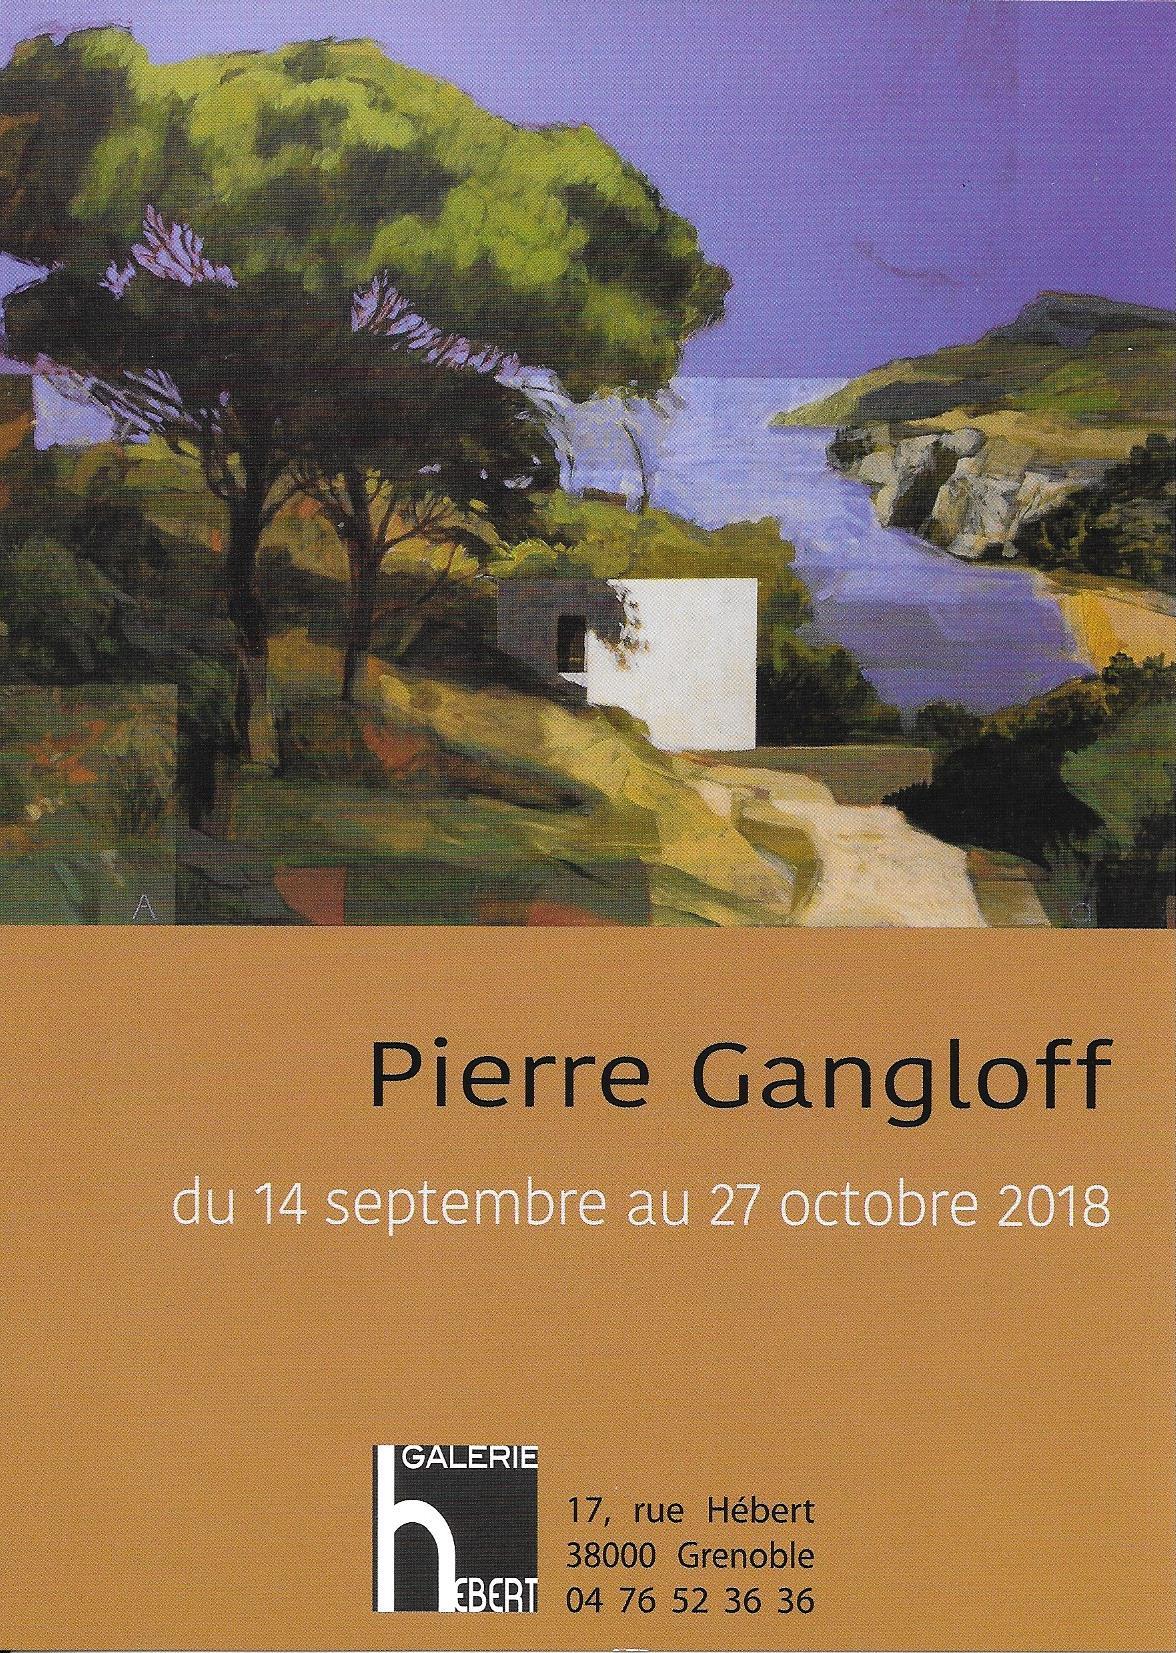 gangloff_grenoble_2018_1